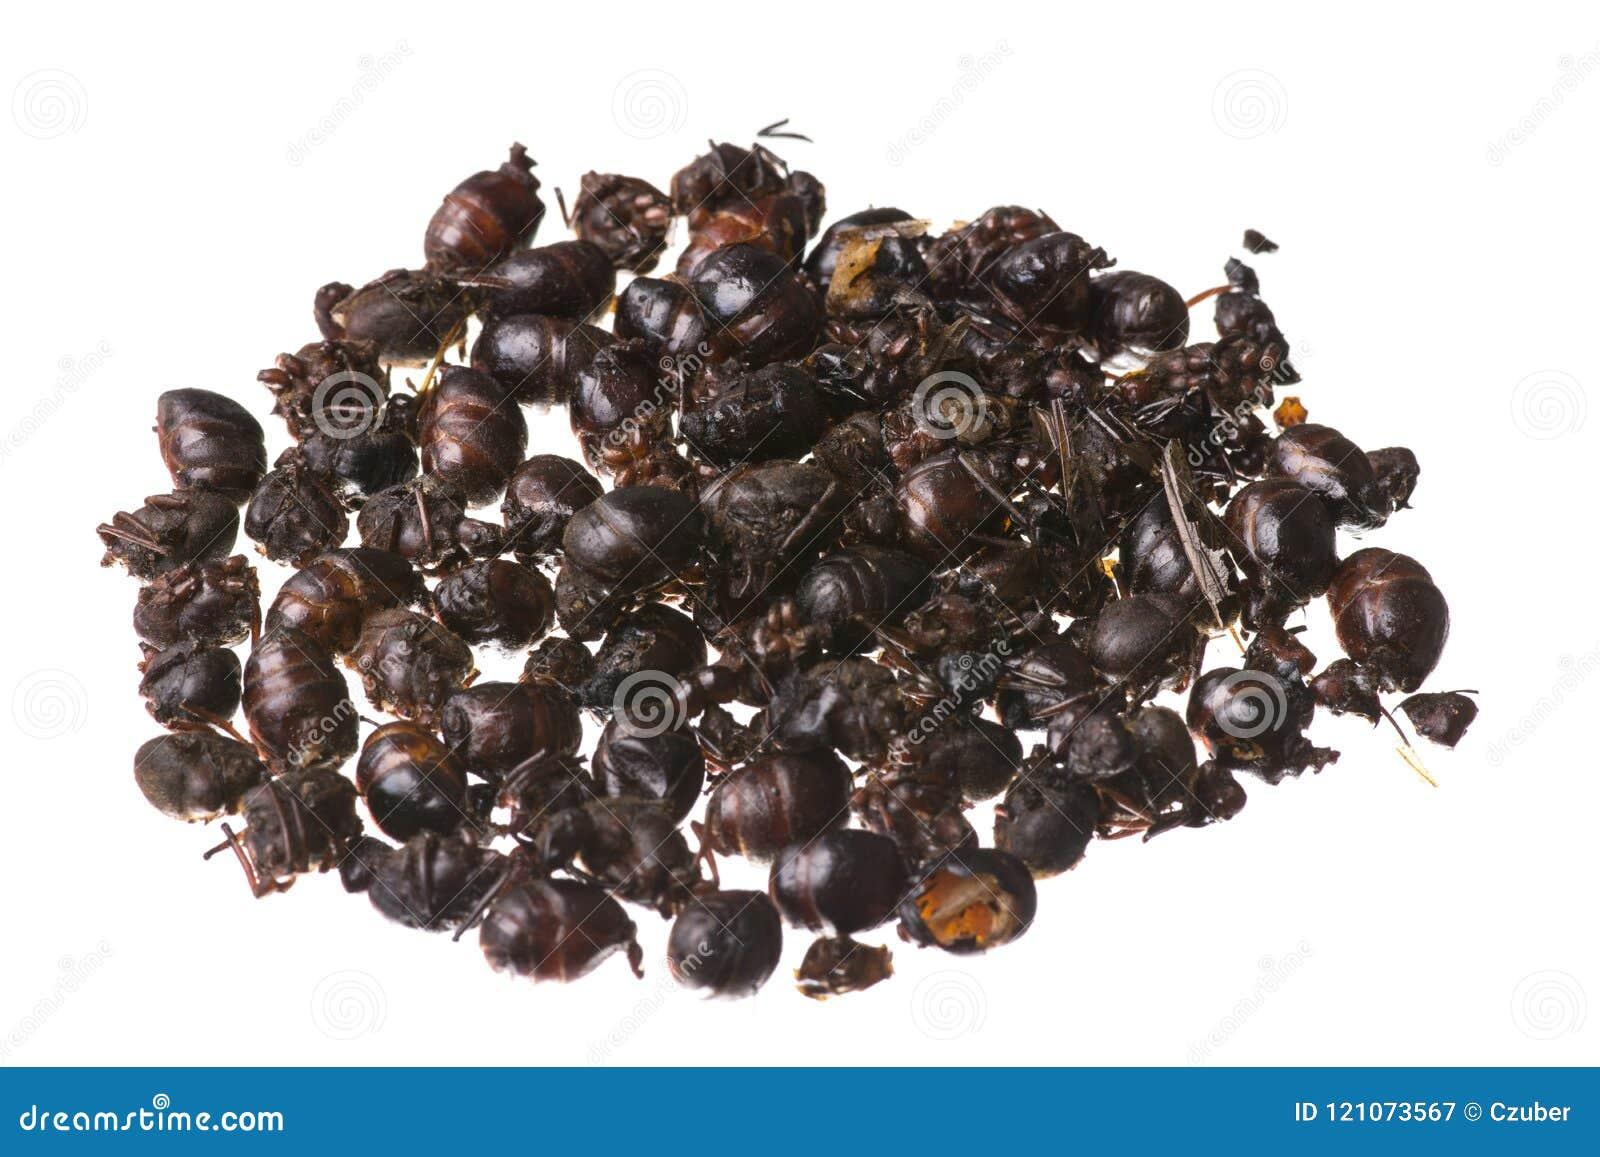 Edible Roasted Flying Ants Isolated On White Background Stock Image